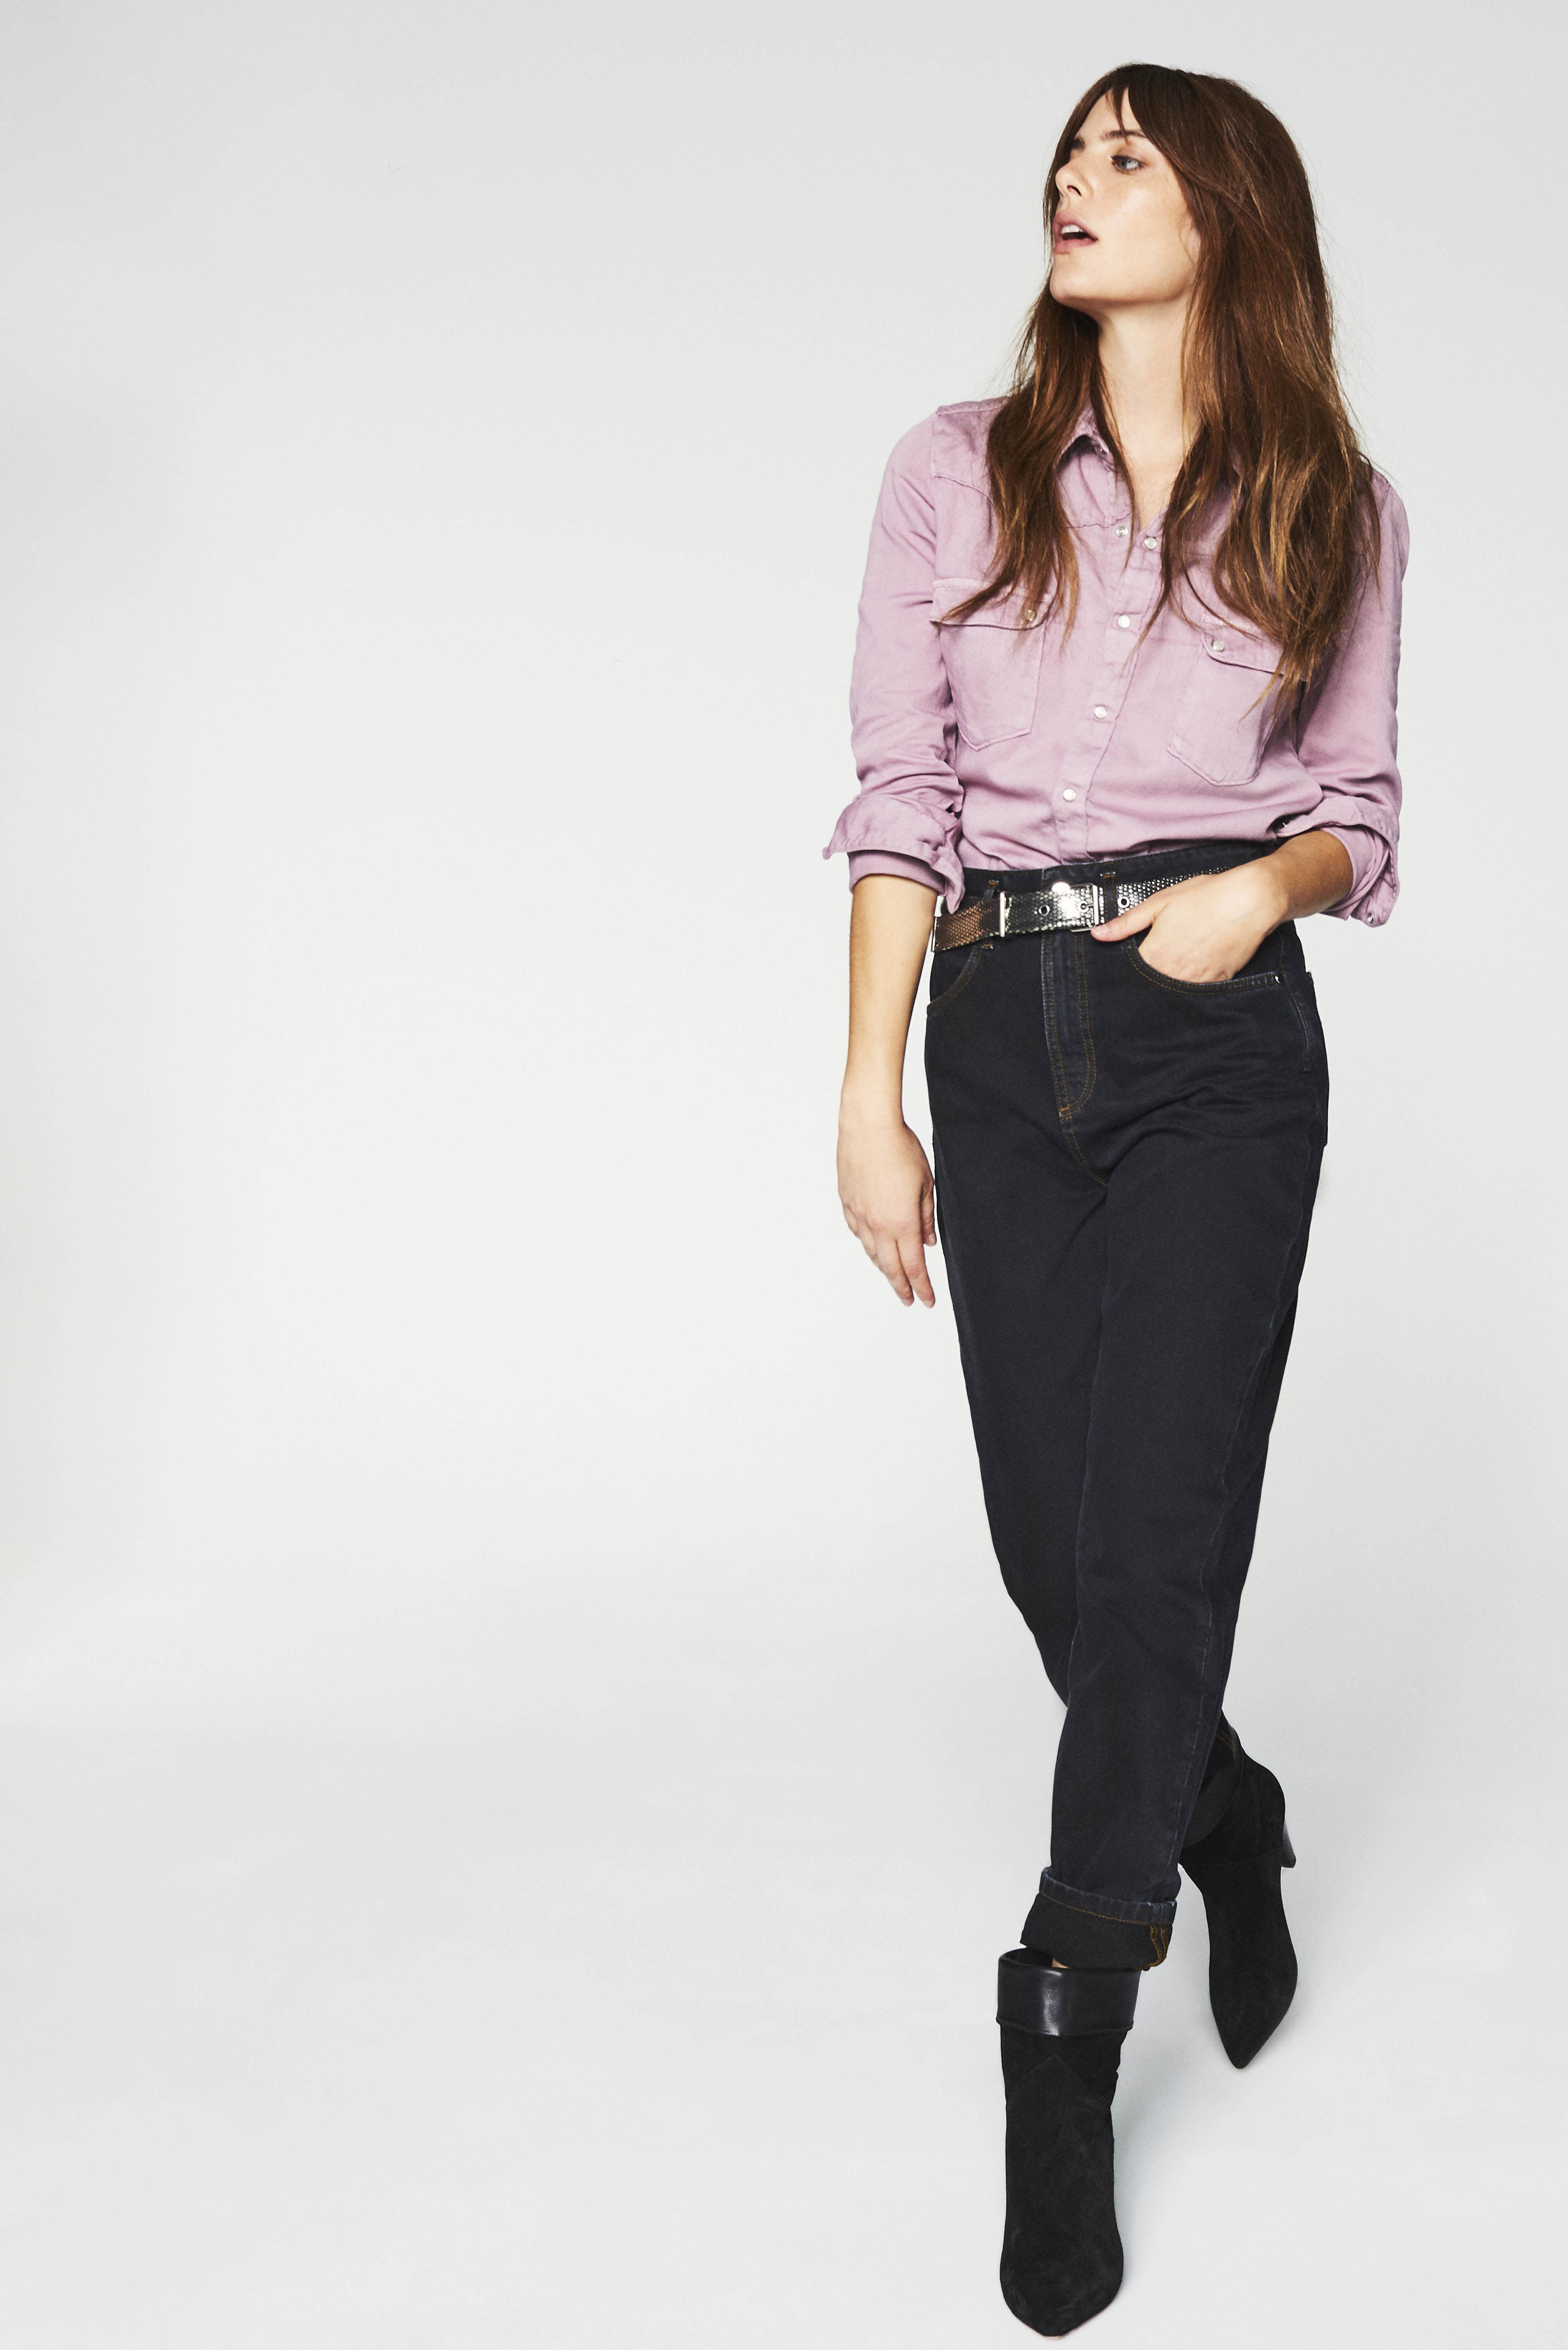 Robe en jean quelle veste